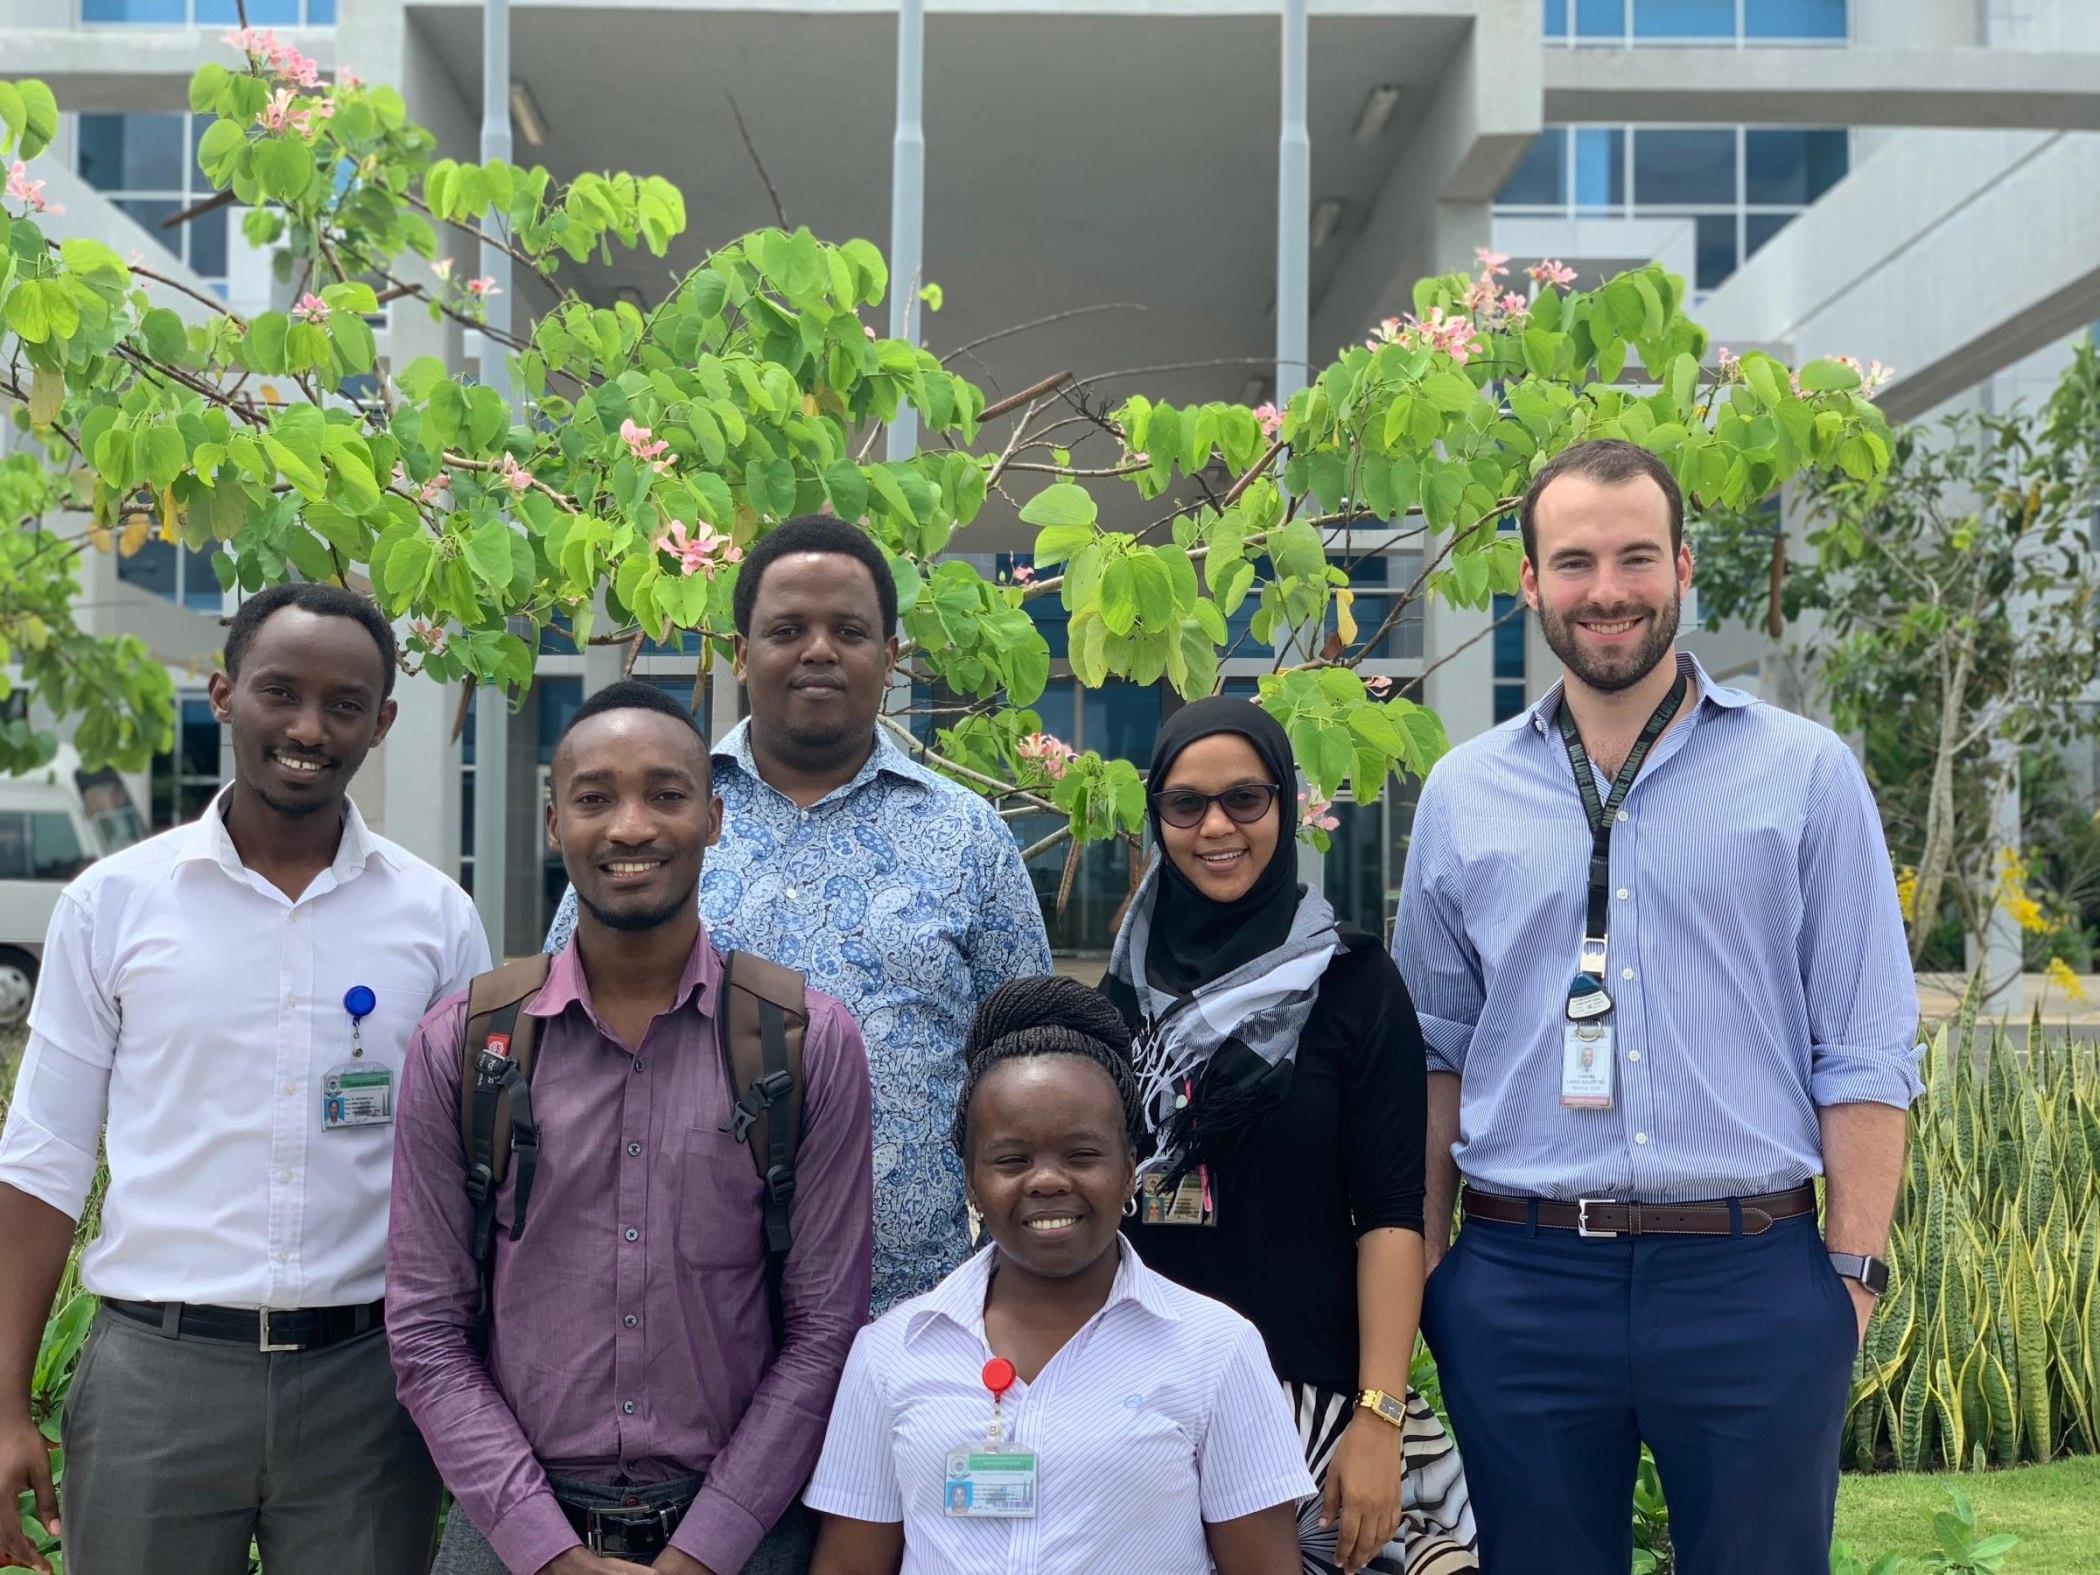 Tanzanian and US IR residents in front of the MNH Mloganzila campus. From left to right: Drs. Ivan Rukundo, Ziad Byekwaso, Erick Mbuguje, Mwivano Shemwetta, Azza Naif, and Fabian Laage Gaupp.